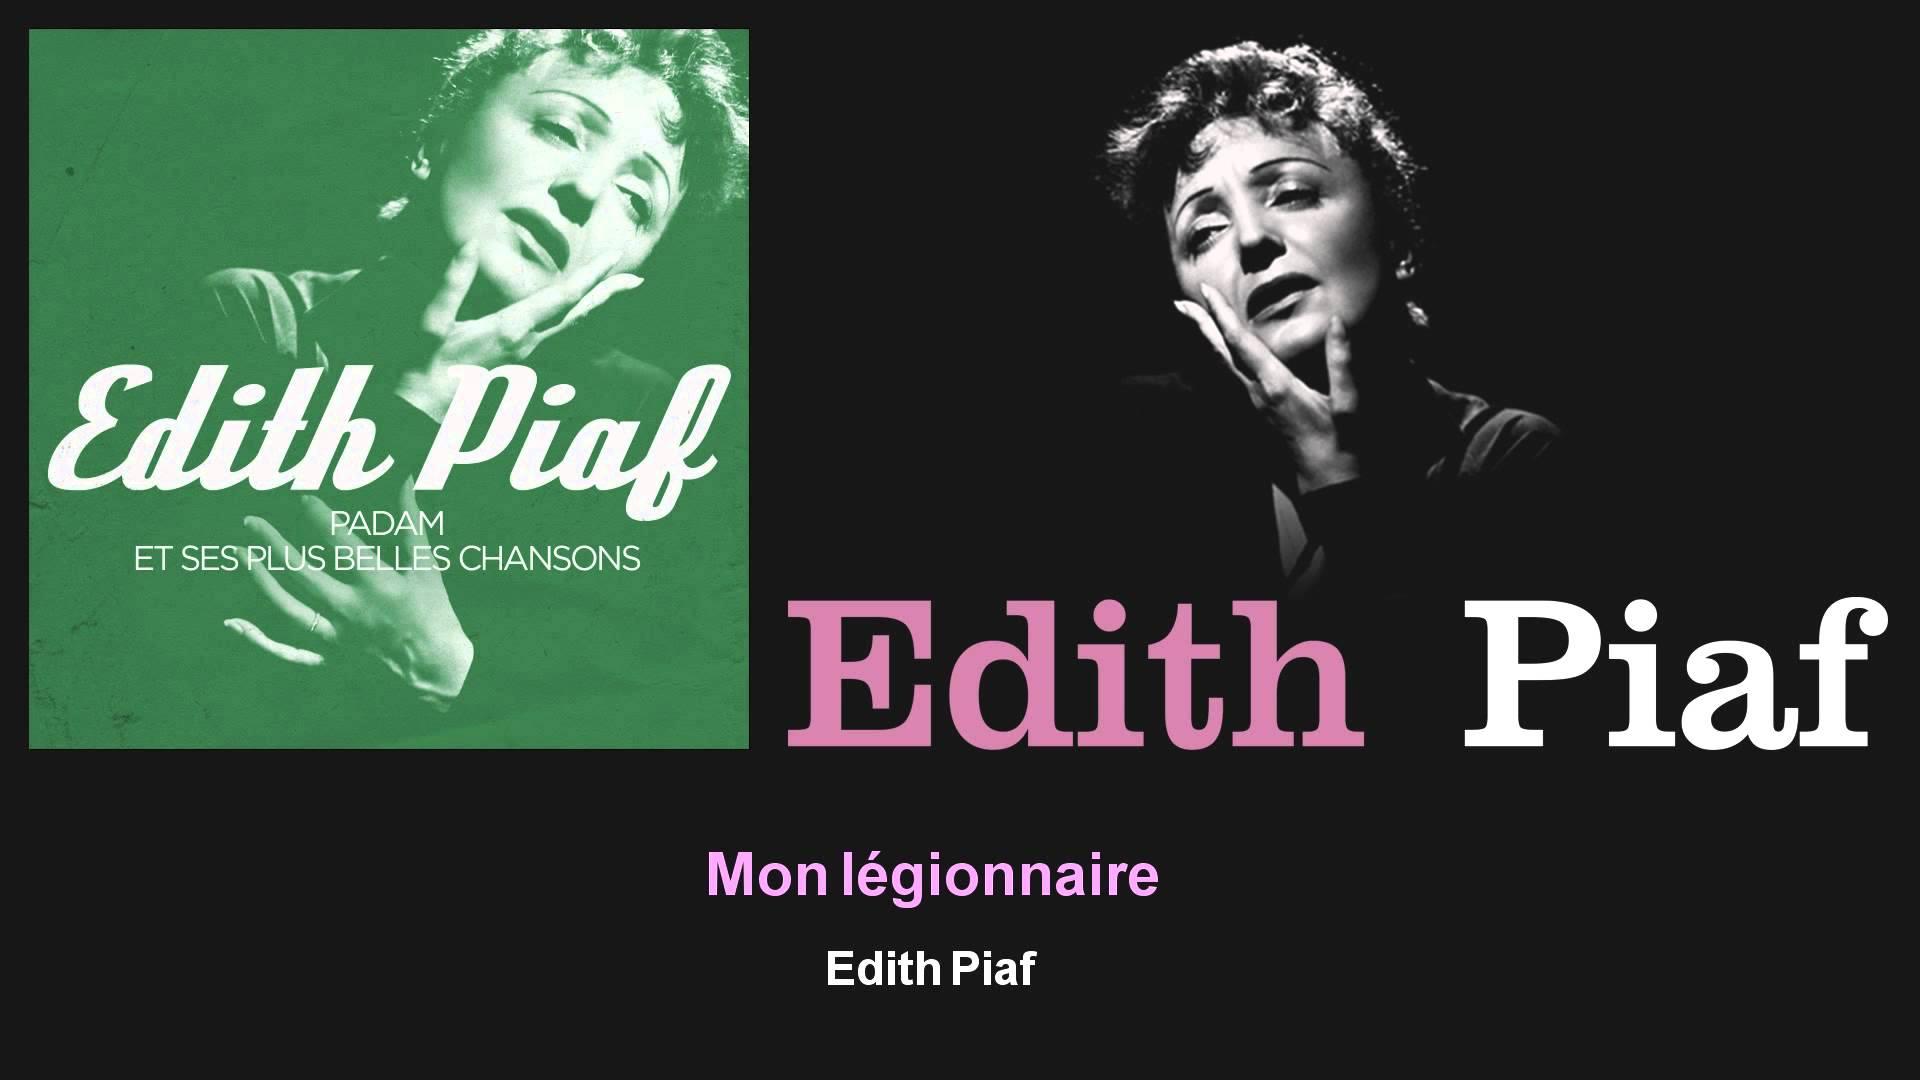 Edith Piaf エディット・ピアフ 人気曲ランキング